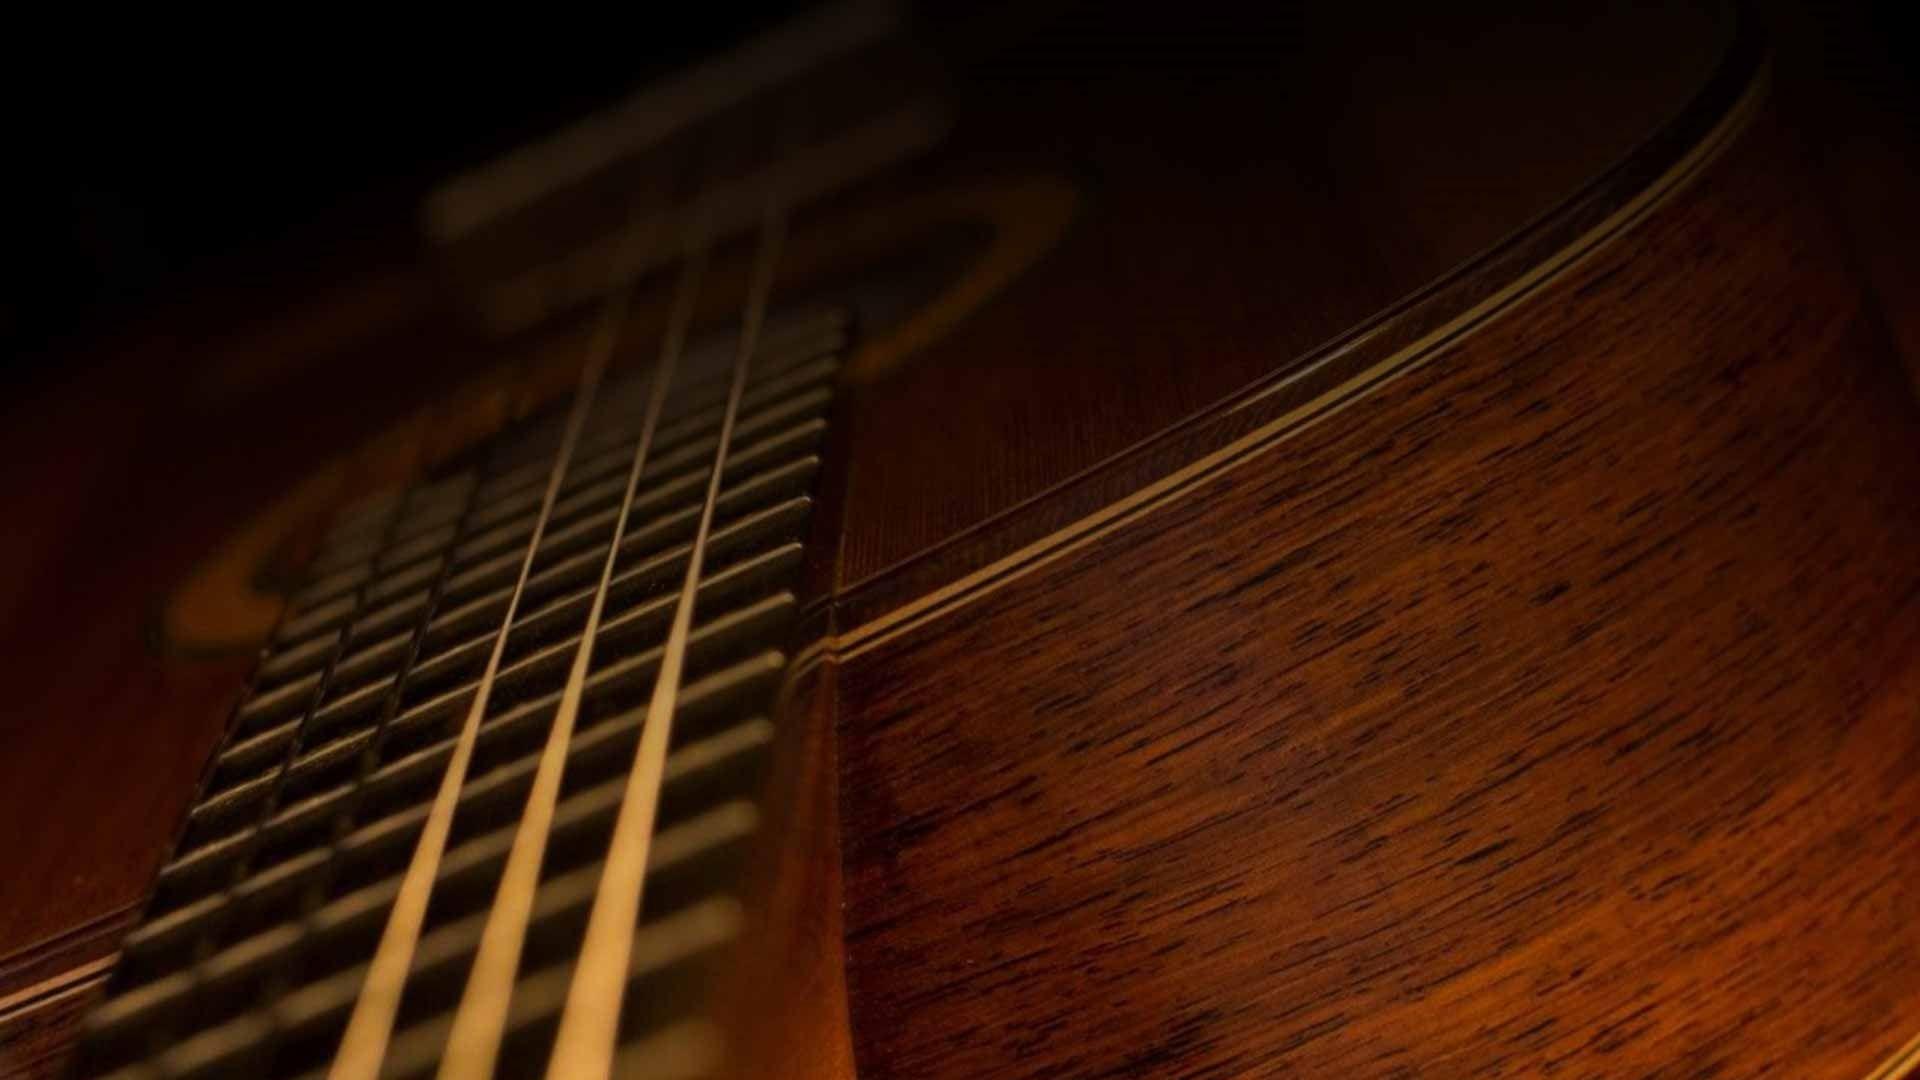 Acoustic Guitar strings, HD Wallpaper